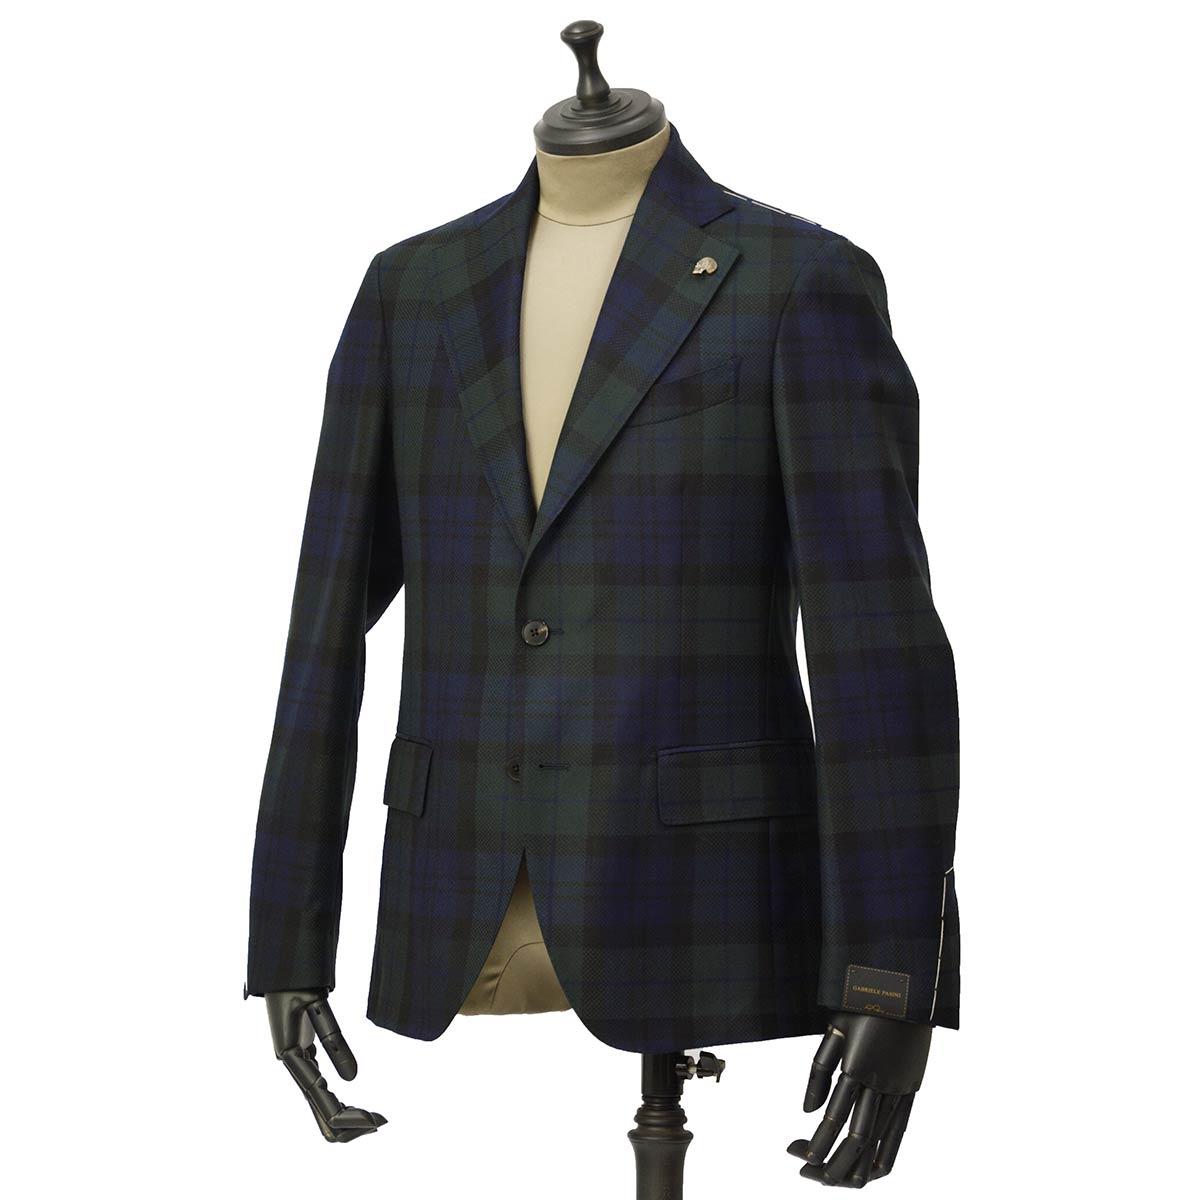 Gabriele Pasini【ガブリエレ パジーニ】シングルジャケット JG14074Q GP14433 10 ウール ブラックウォッチ グリーン ネイビー ブラック